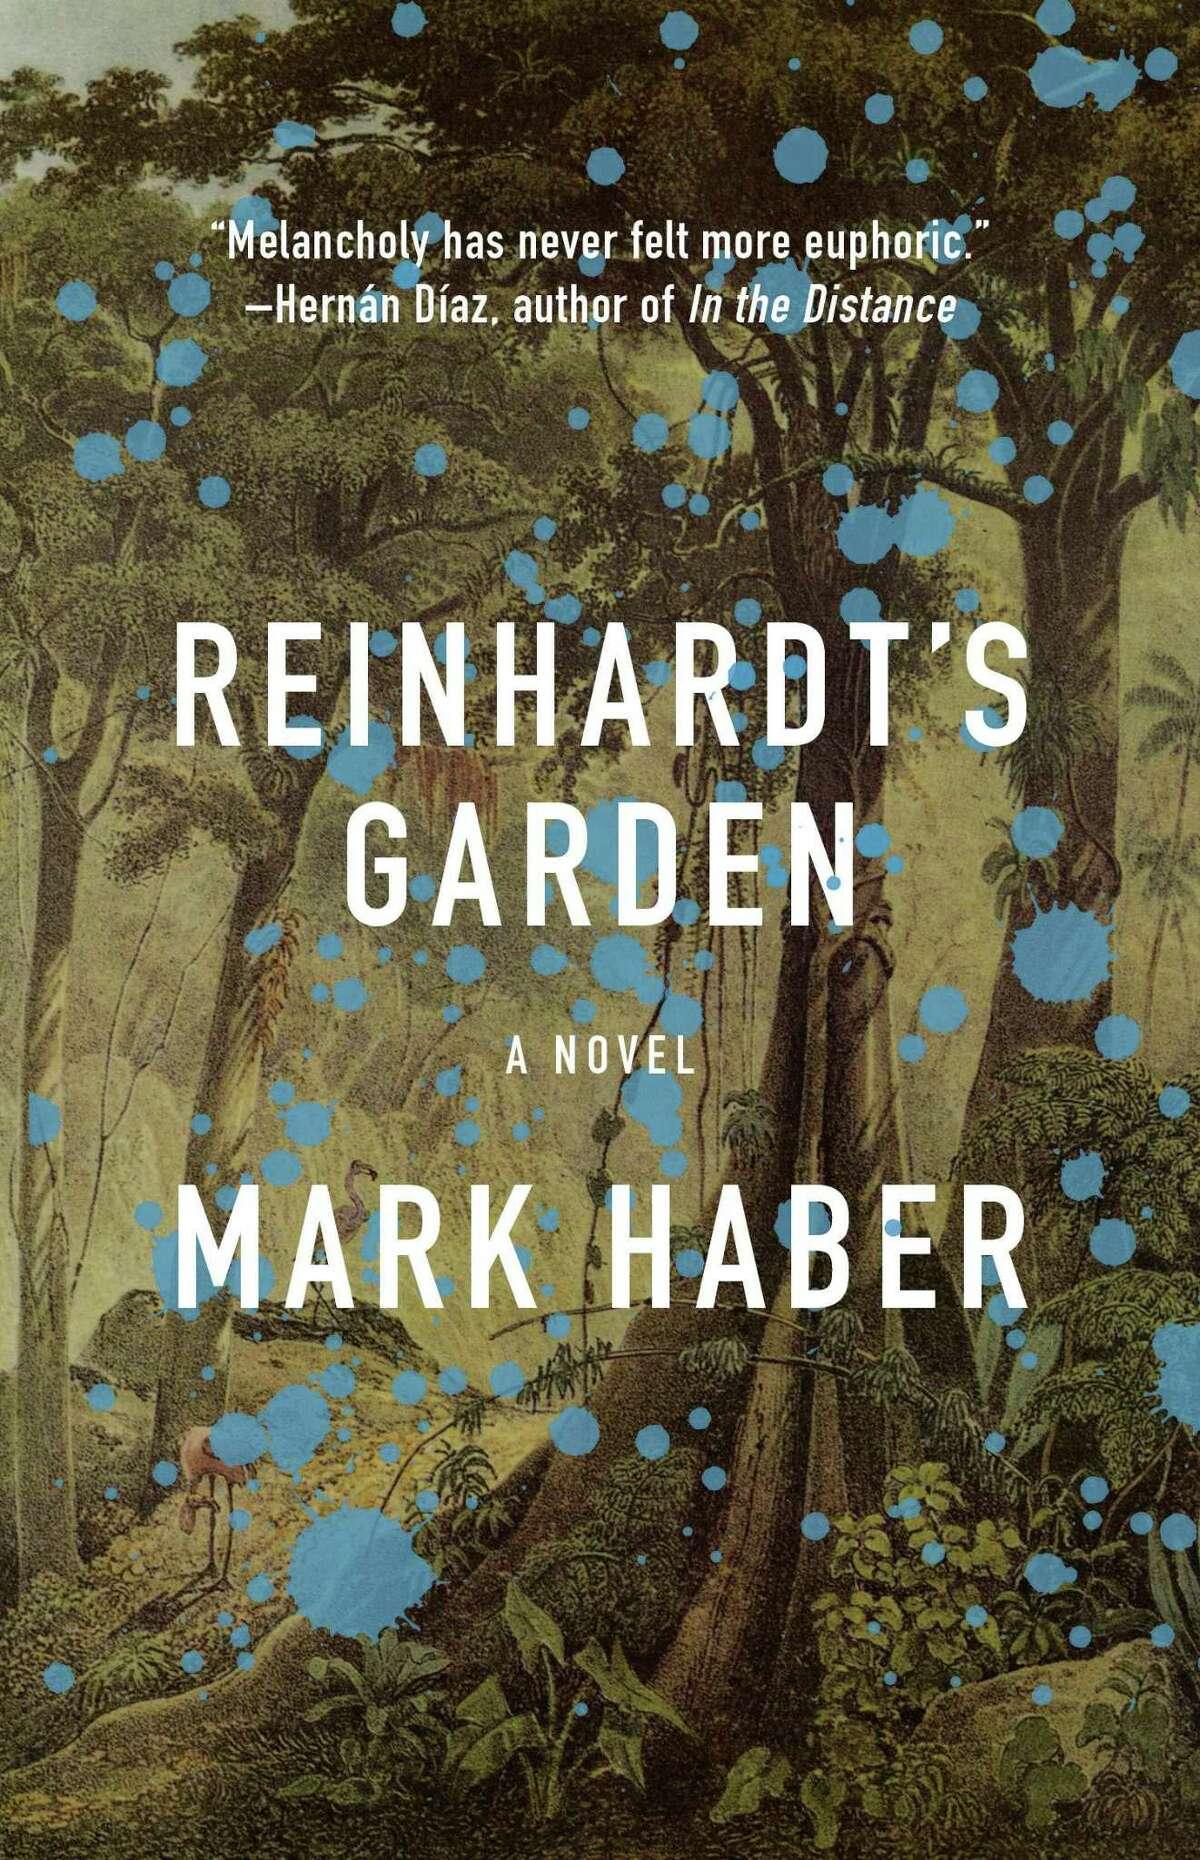 Cover image for Reinhardt's Garden, a novel by Mark Haber